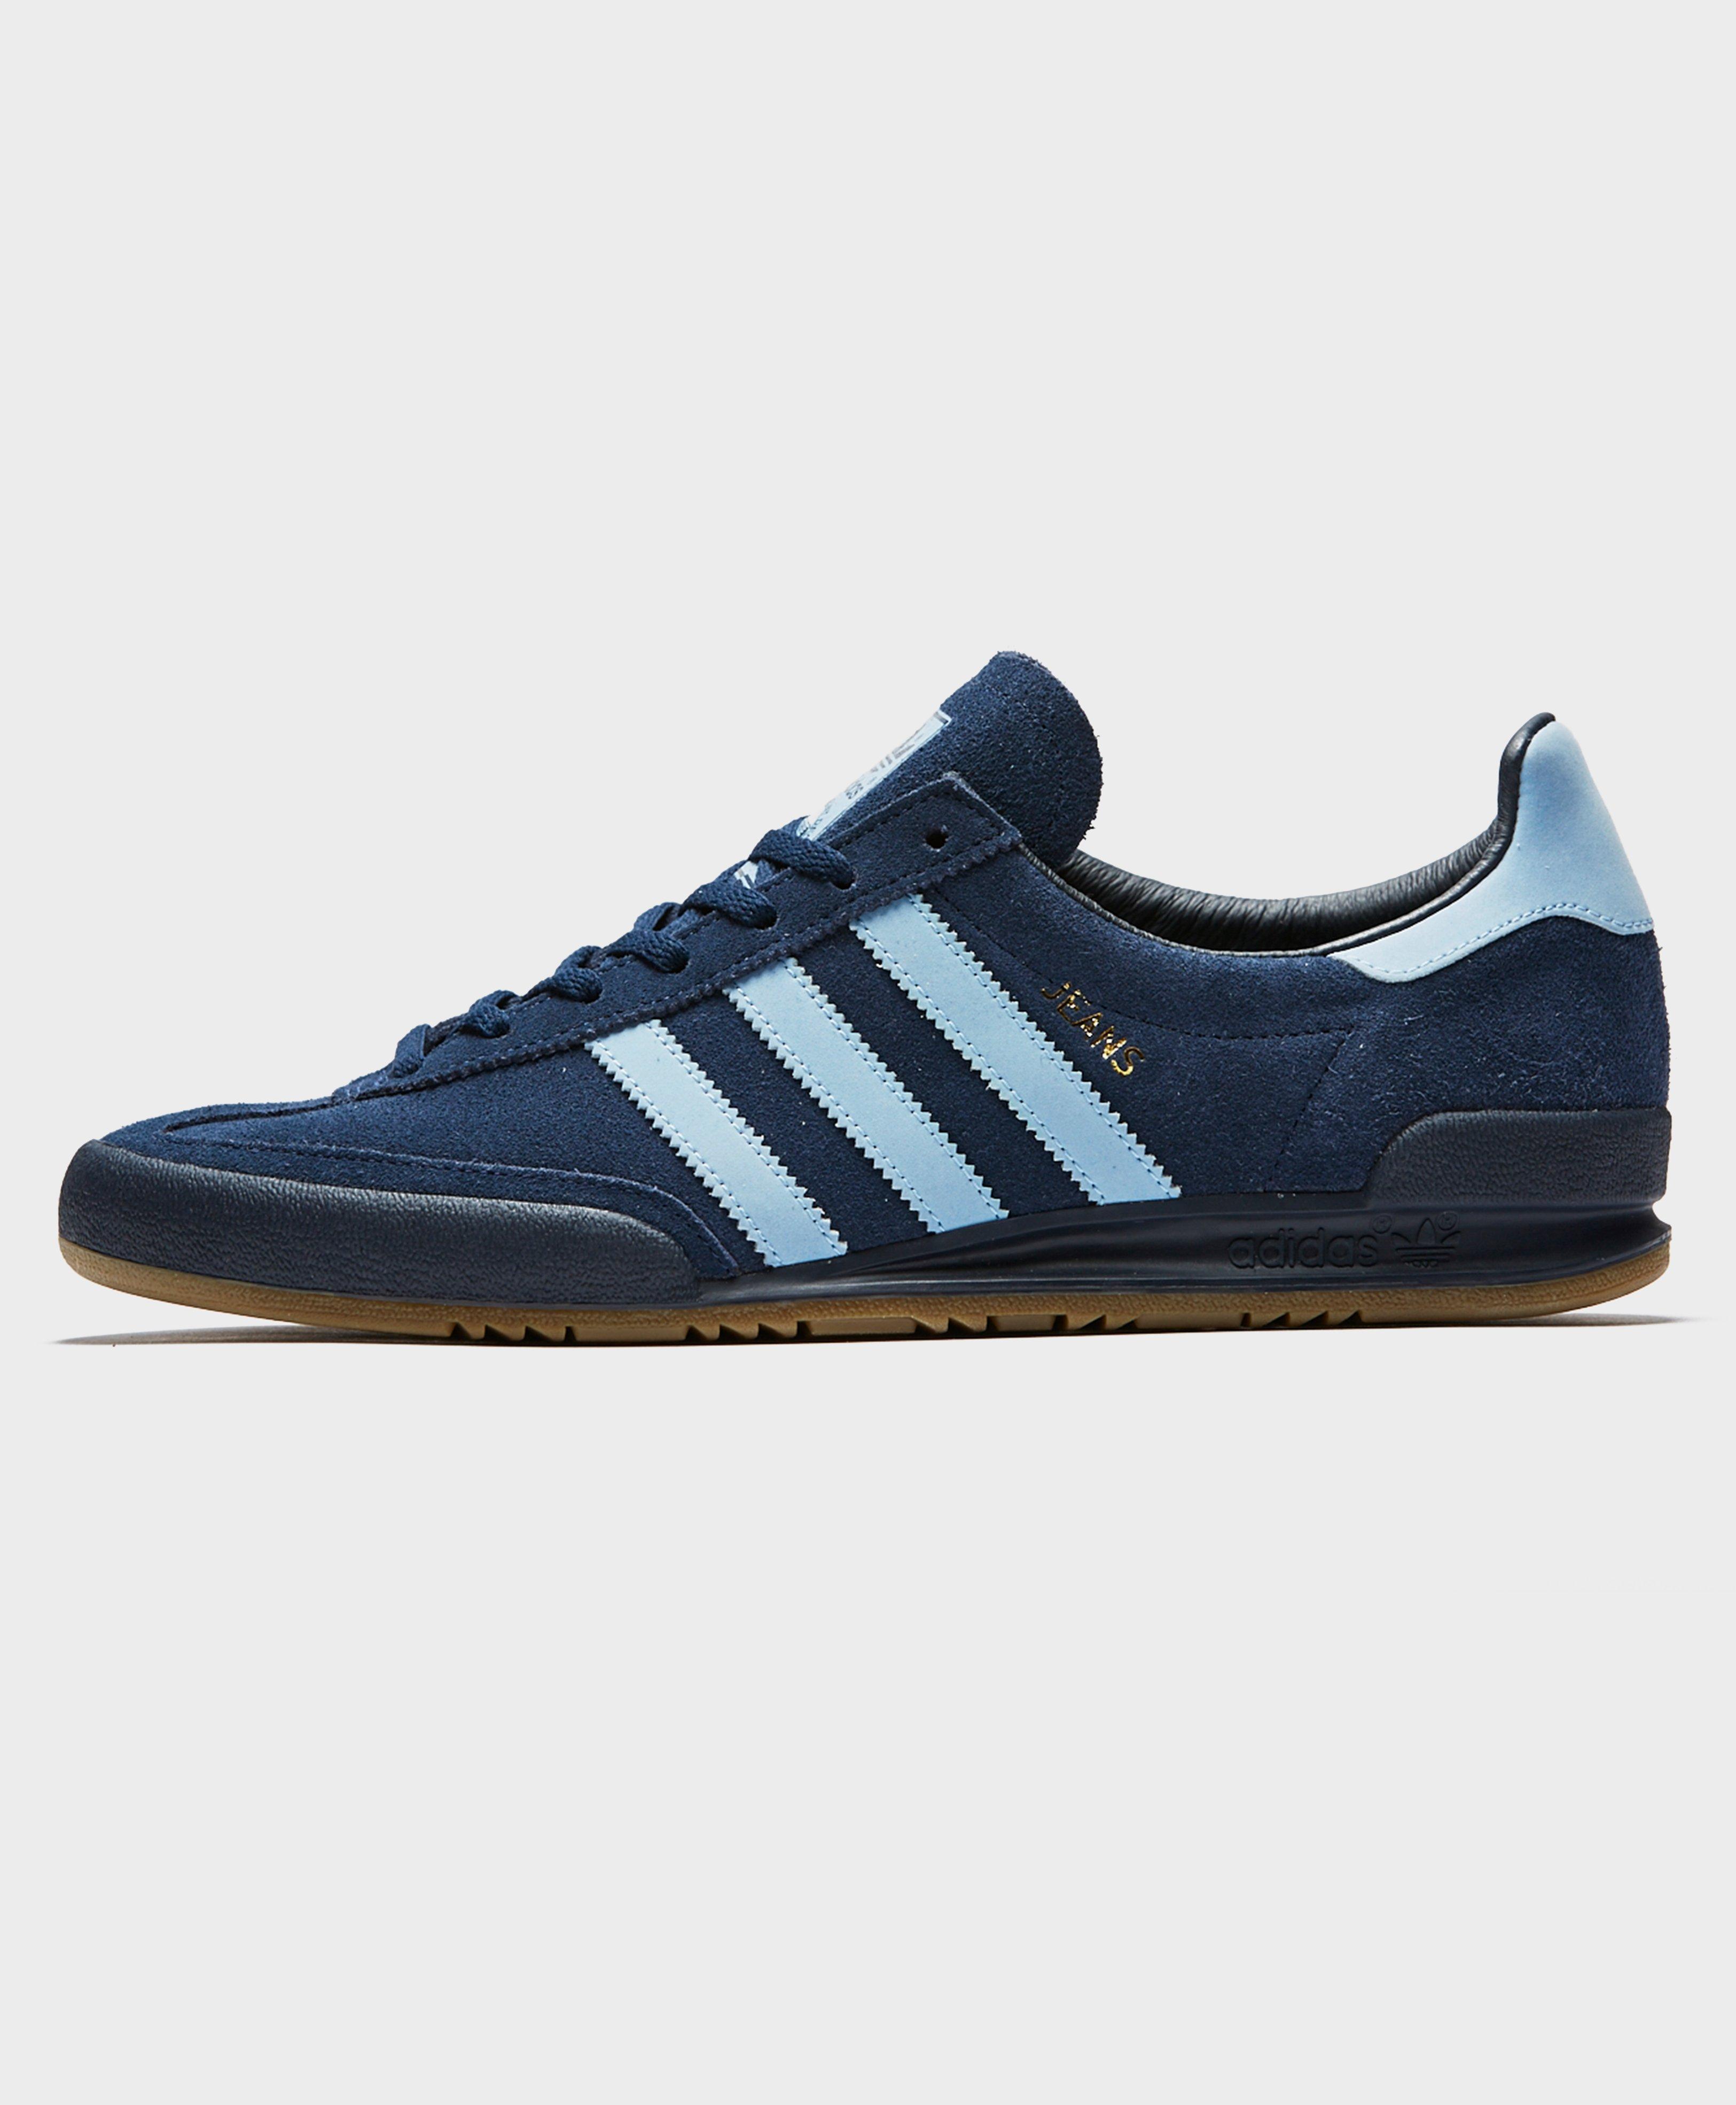 0761b2b4cc50 Lyst - adidas Originals Jeans in Blue for Men